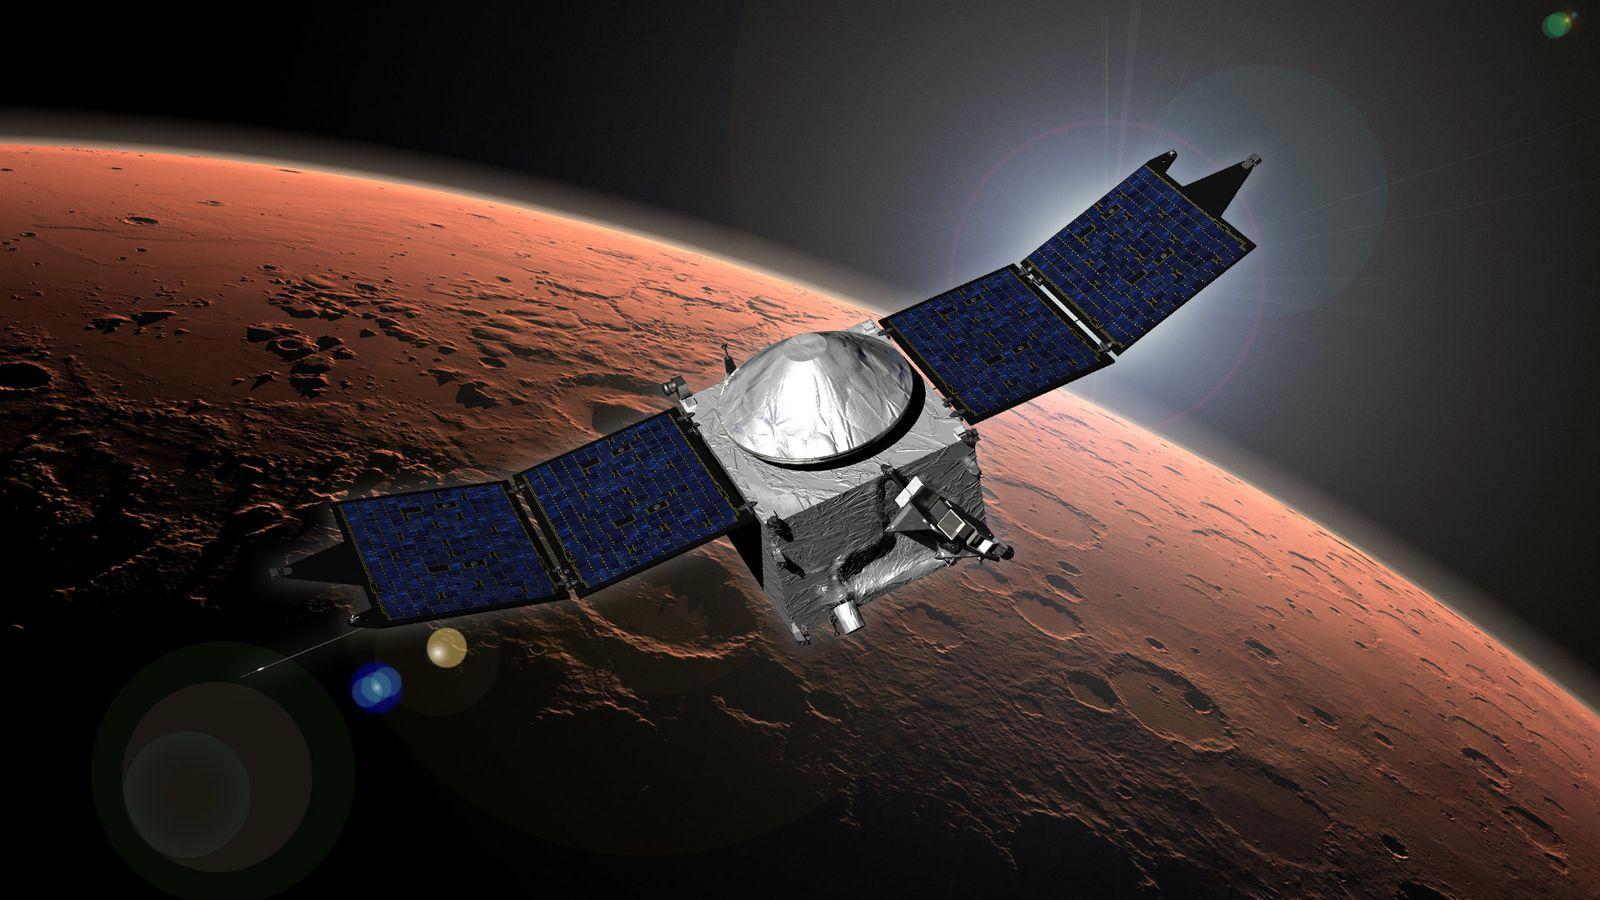 Mars/ US-Sonde/ Maven